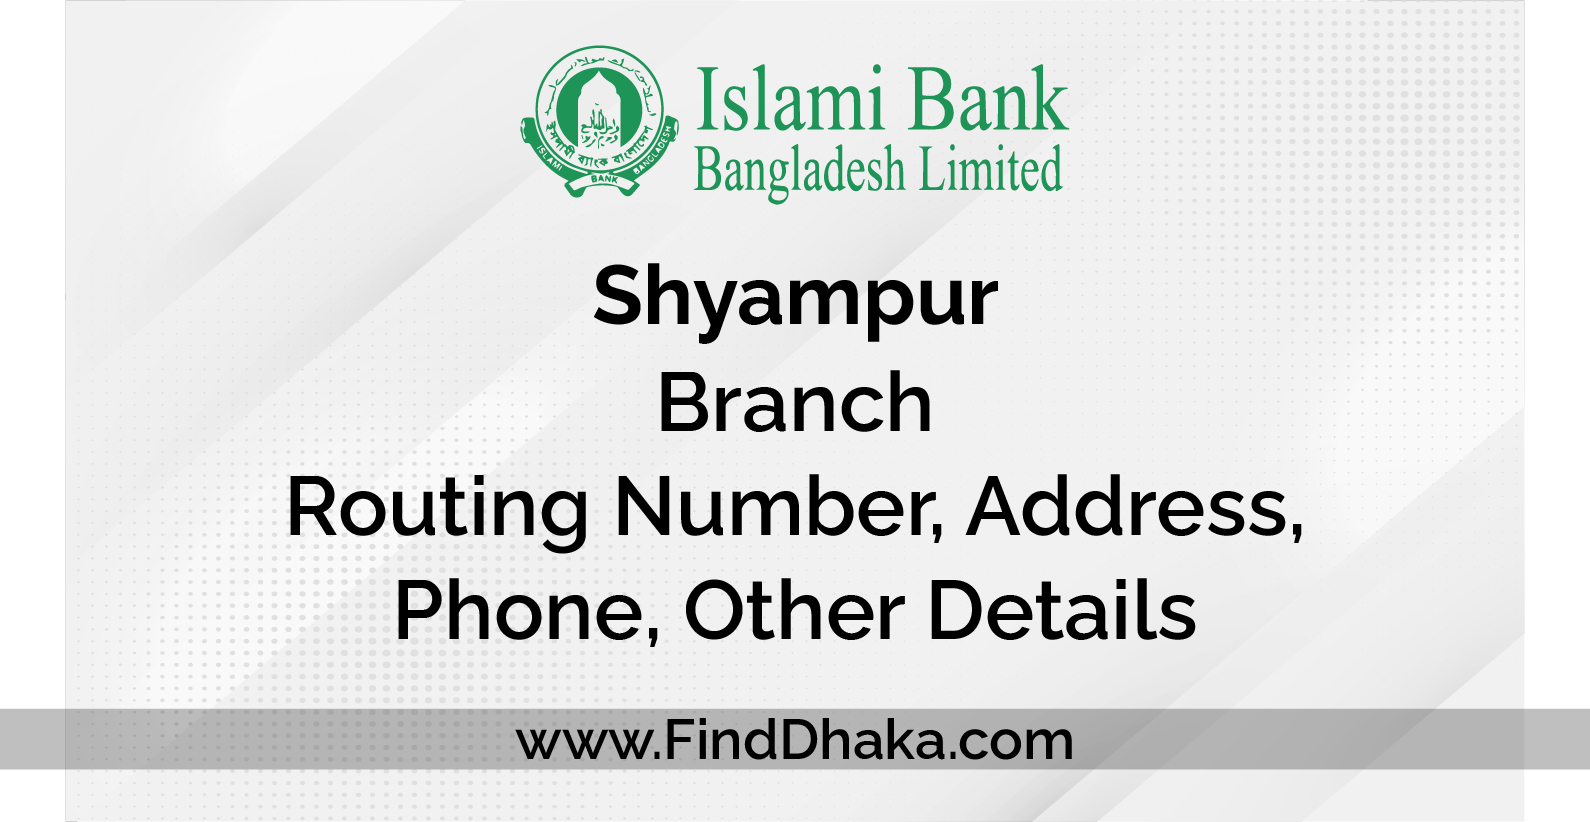 Photo of Islami Bank Shyampur Branch